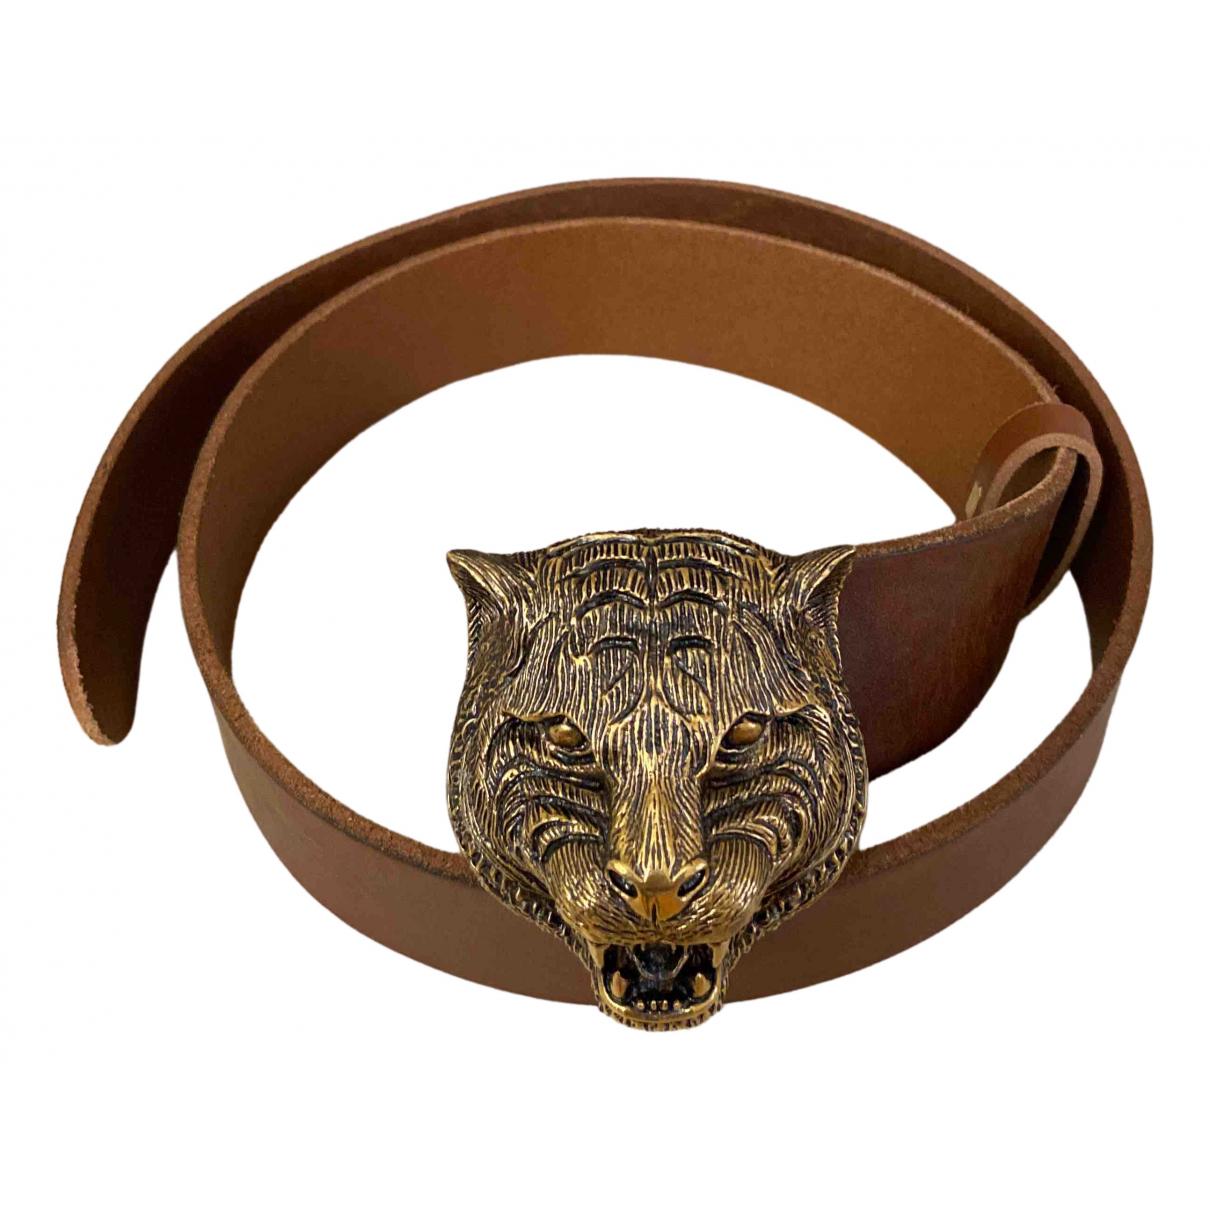 Gucci Feline Buckle Brown Leather belt for Women 80 cm